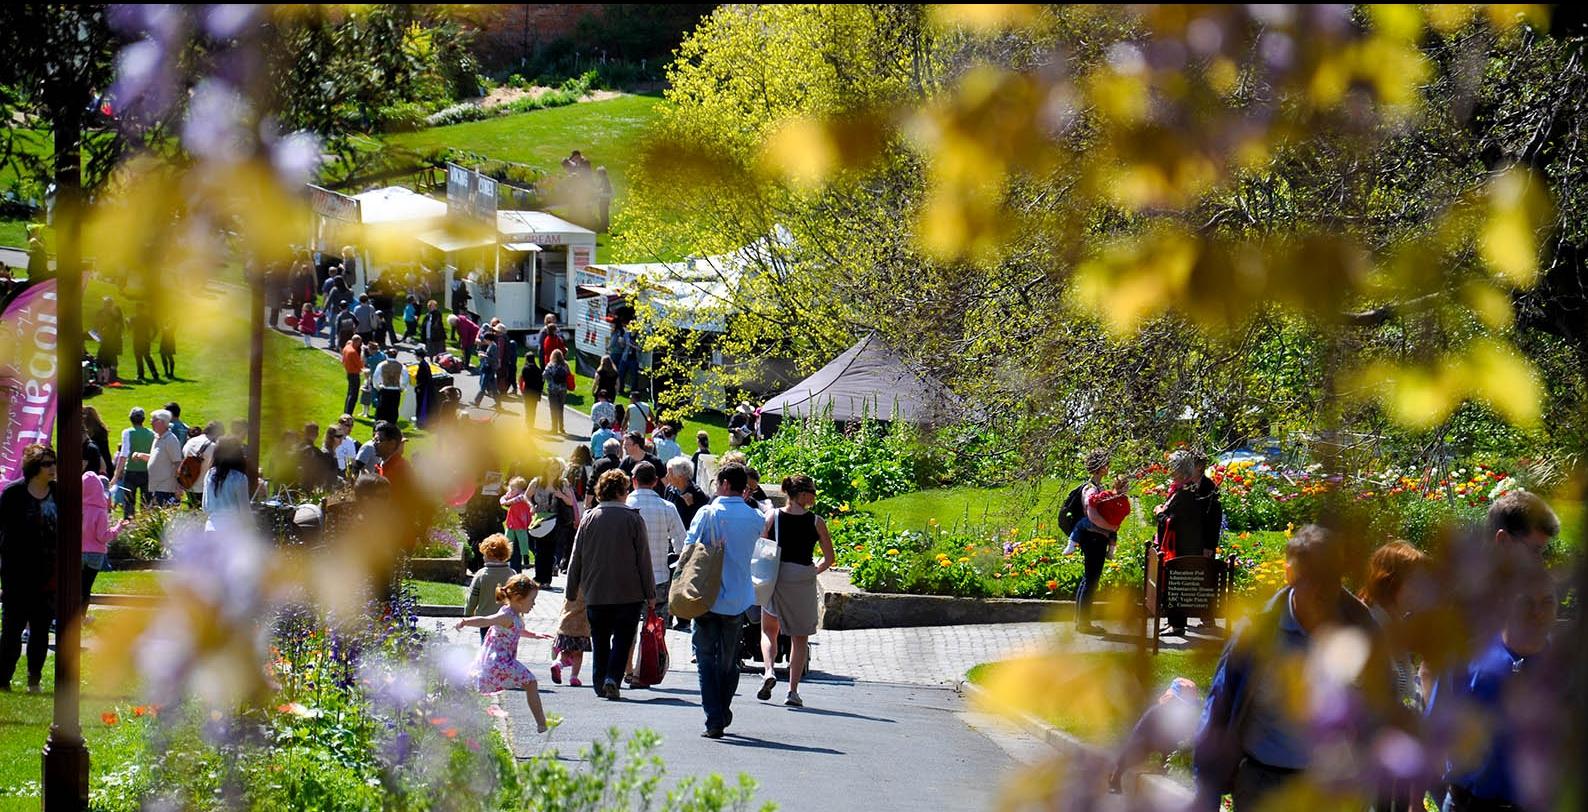 Spring Community Festival 2011- Wisteria View